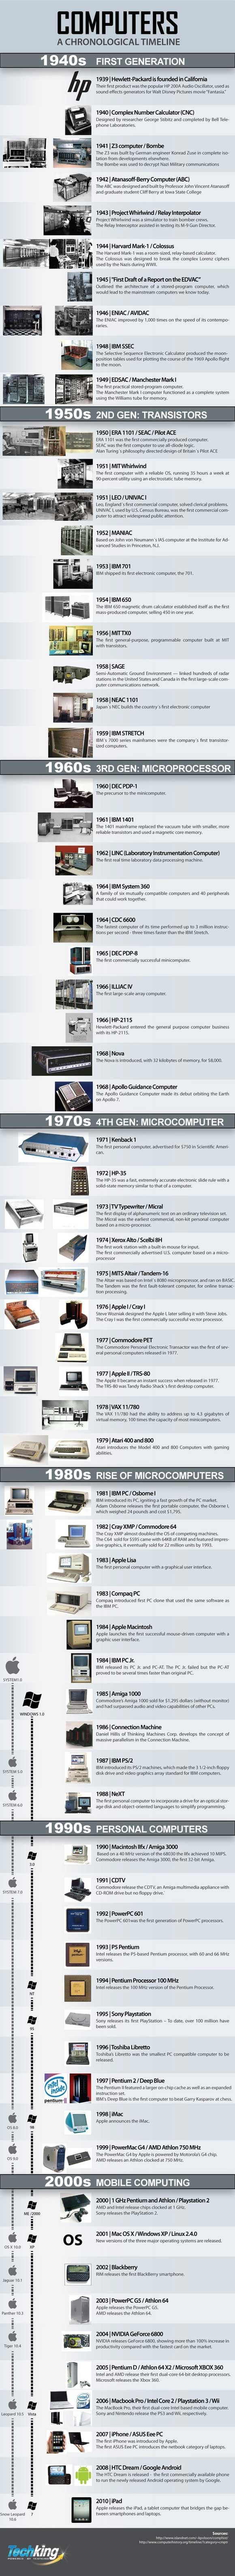 La historia de las computadoras (1940-2010) #infográfico